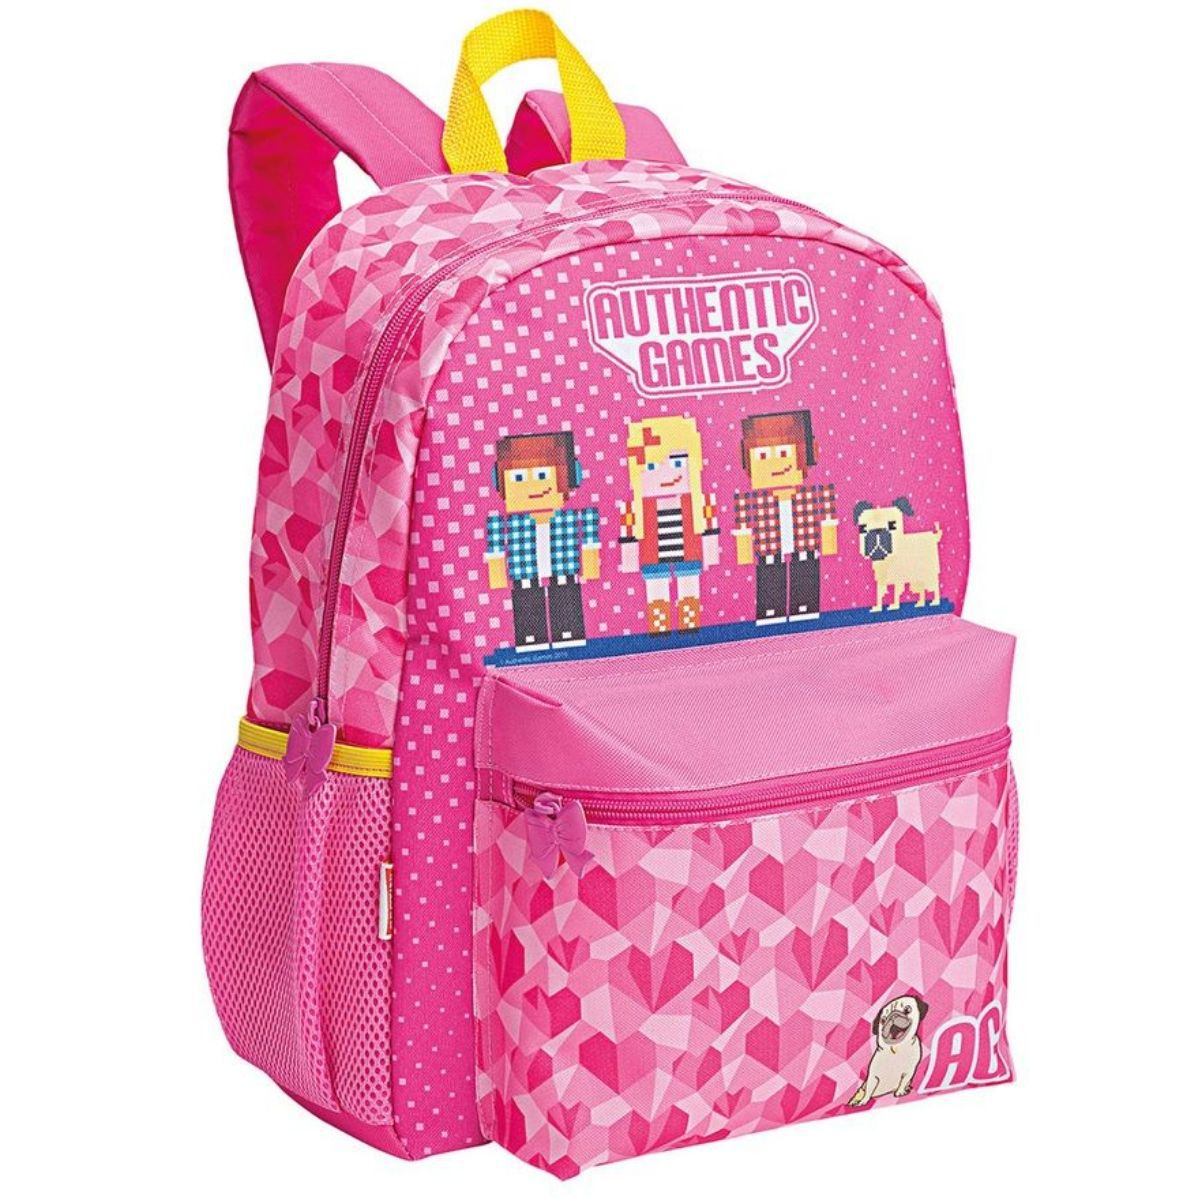 Mochila Escolar Infantil Feminina Authentic Games Lídia 20M Rosa Sestini - 065575-00